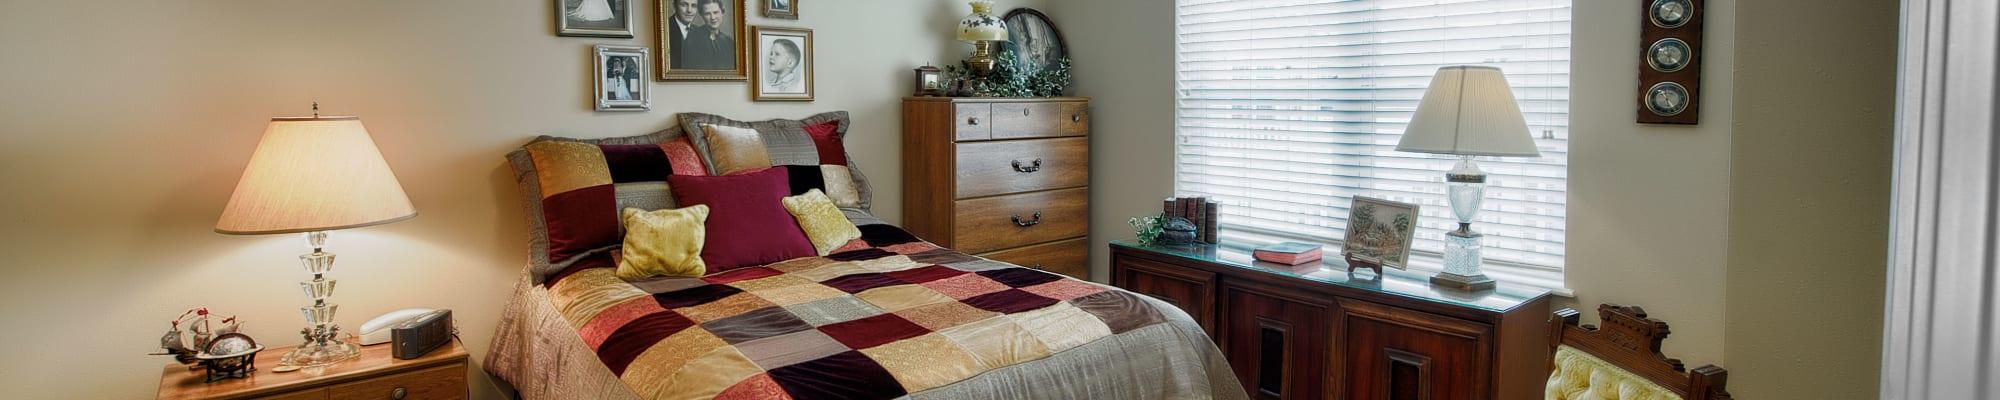 Floor Plans & Pricing at The Keystones of Cedar Rapids in Cedar Rapids, Iowa